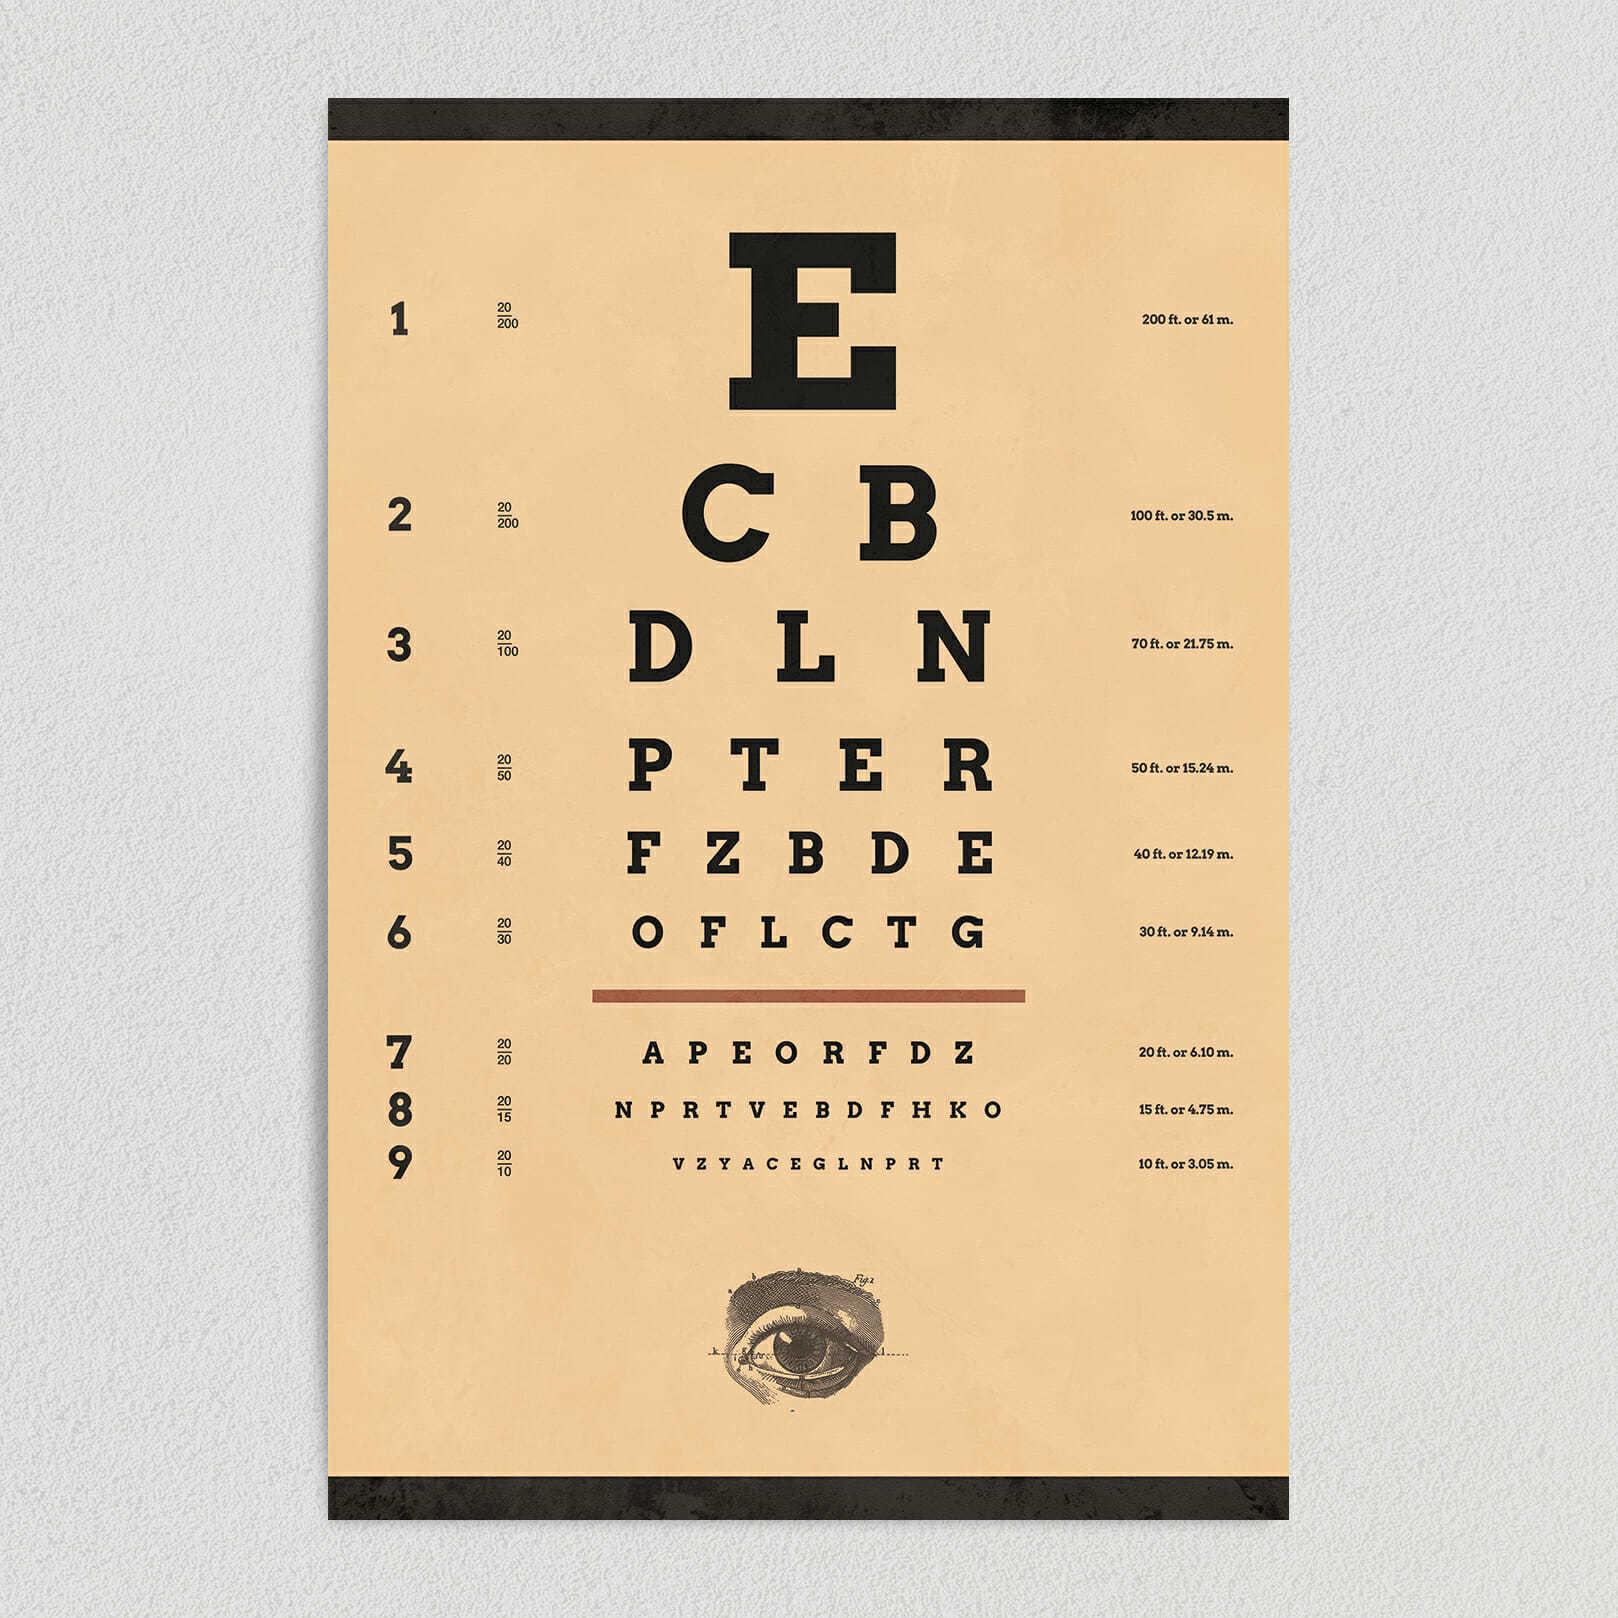 Human Eye Anatomy Ophthalmology Art Print Poster 12″ x 18″ Wall Art MS1000